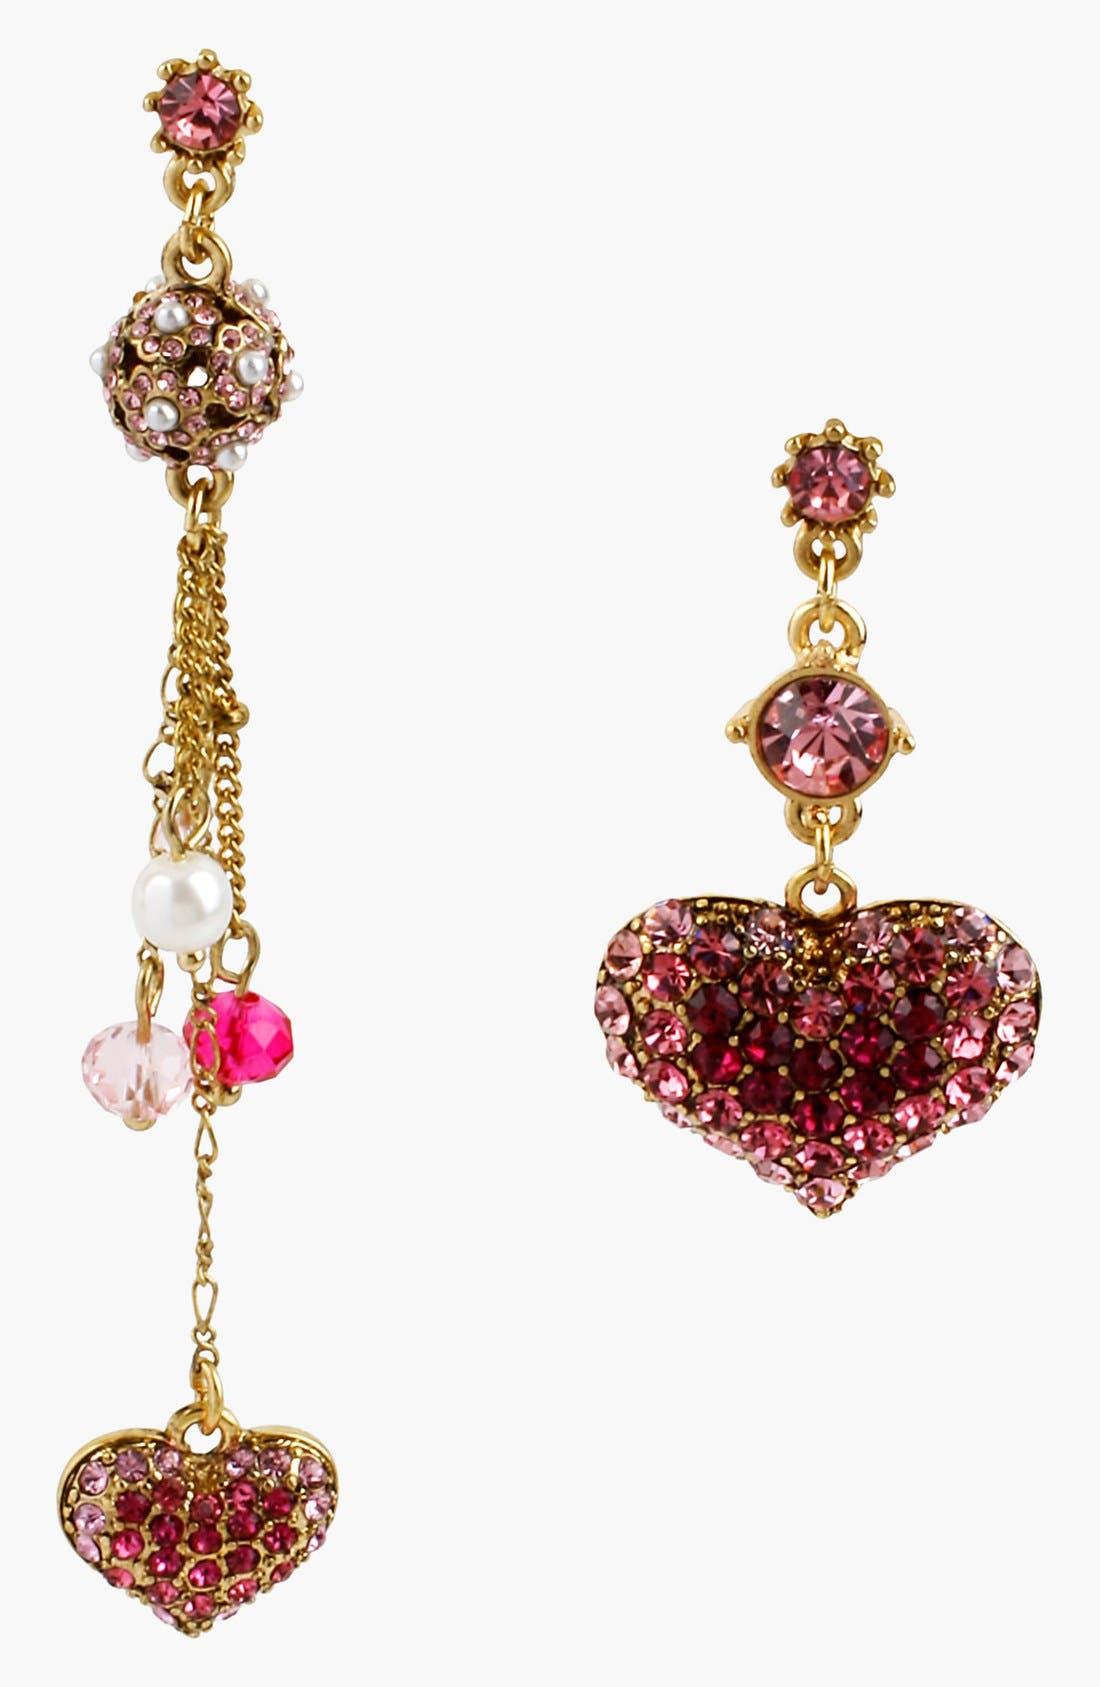 Main Image - Betsey Johnson 'Vintage Bow' Mismatch Heart Linear Earrings